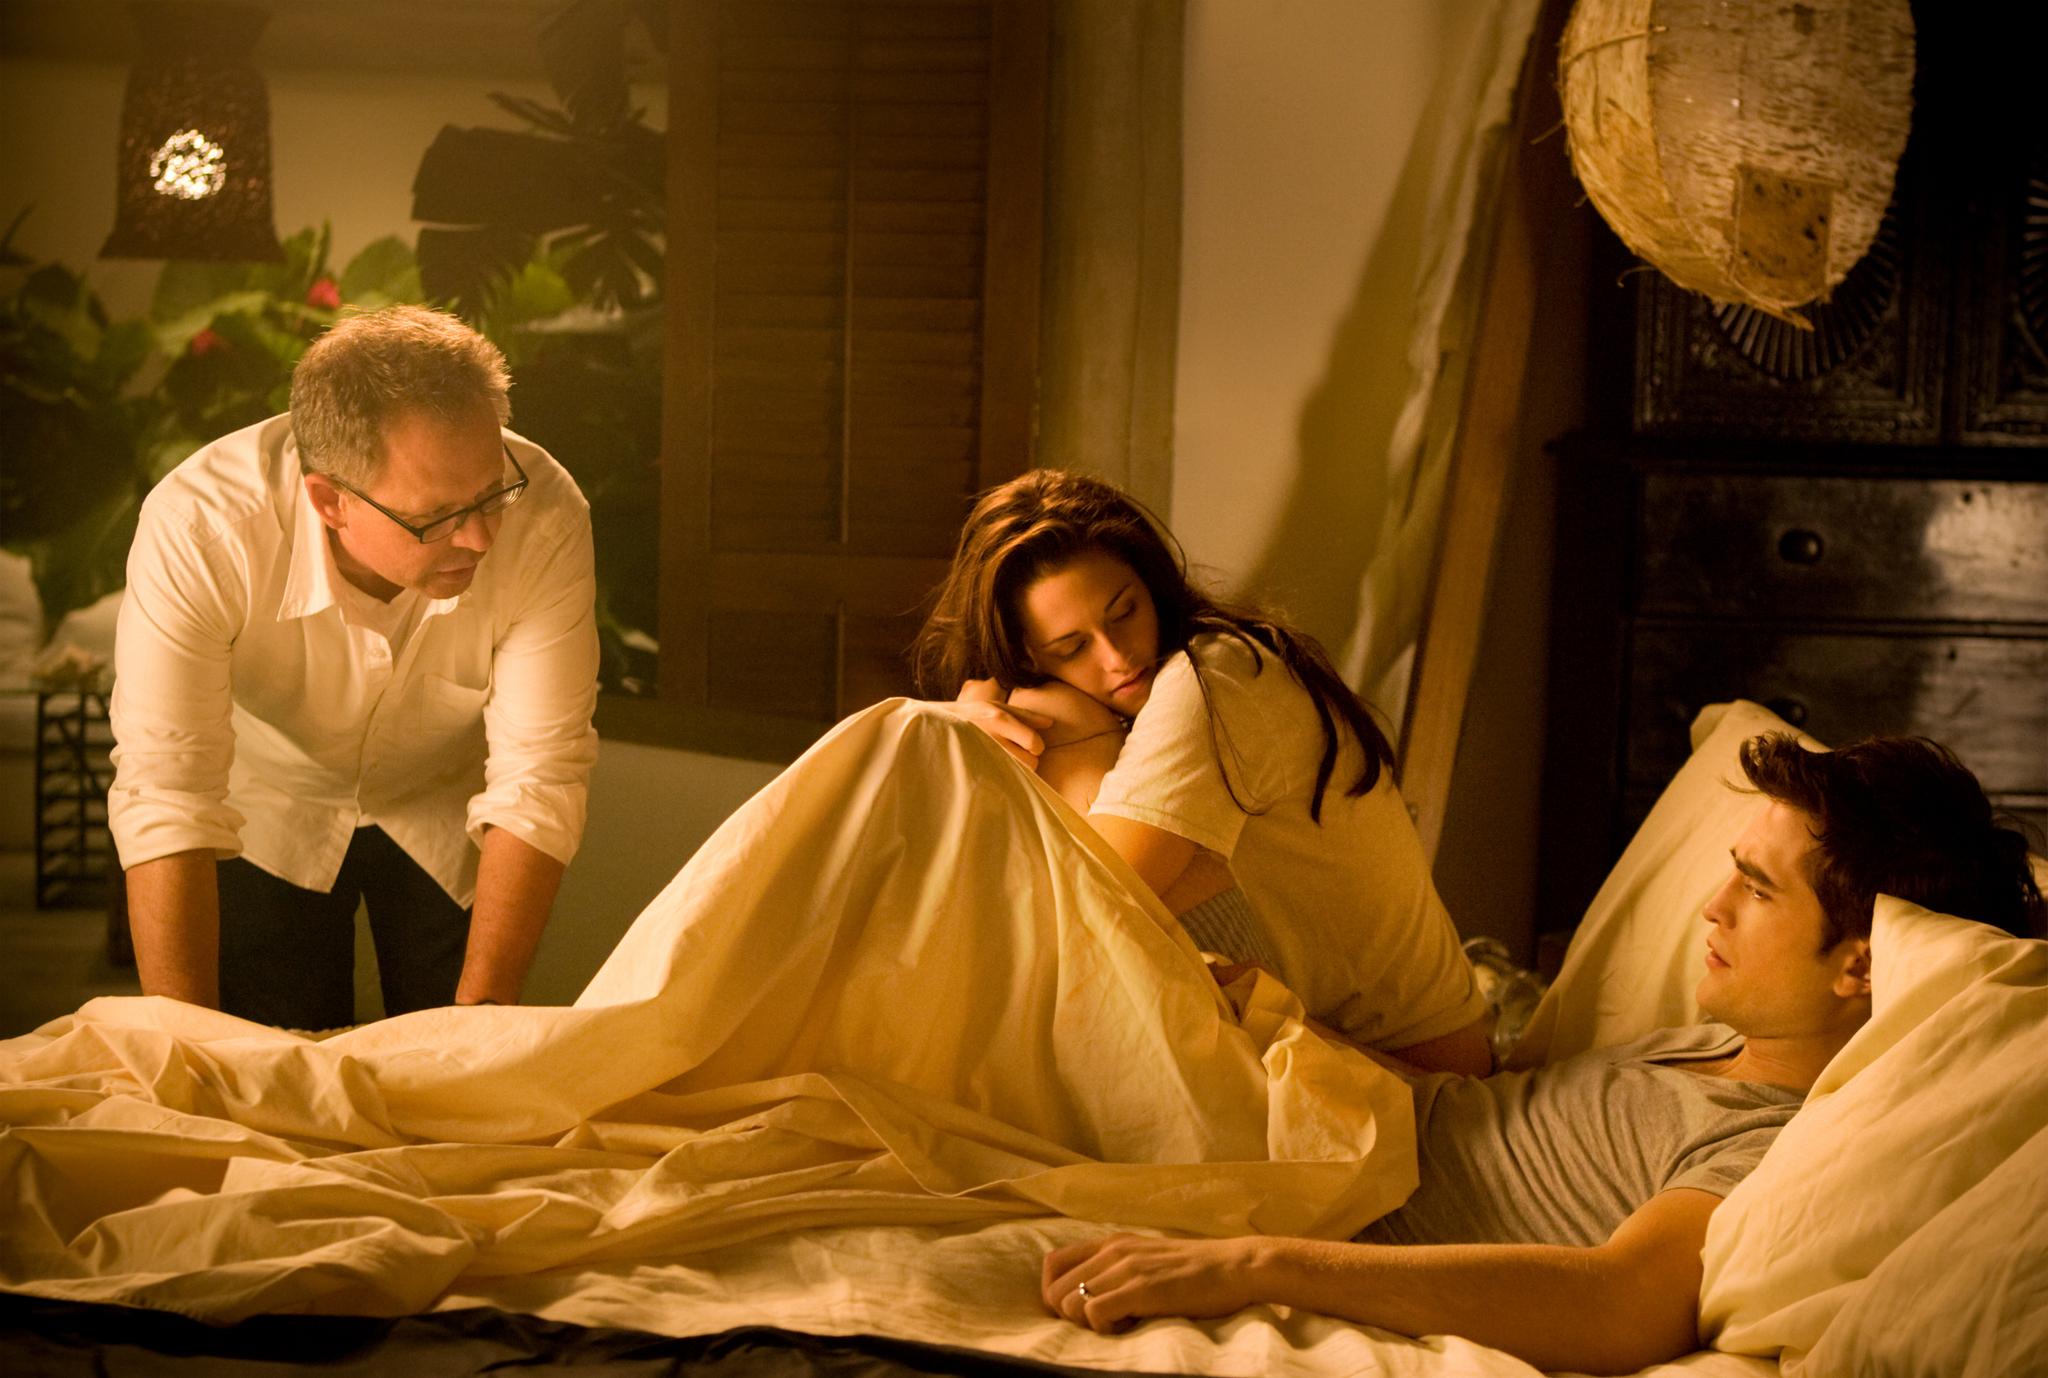 Bill Condon, Kristen Stewart, and Robert Pattinson in The Twilight Saga: Breaking Dawn - Part 1 (2011)